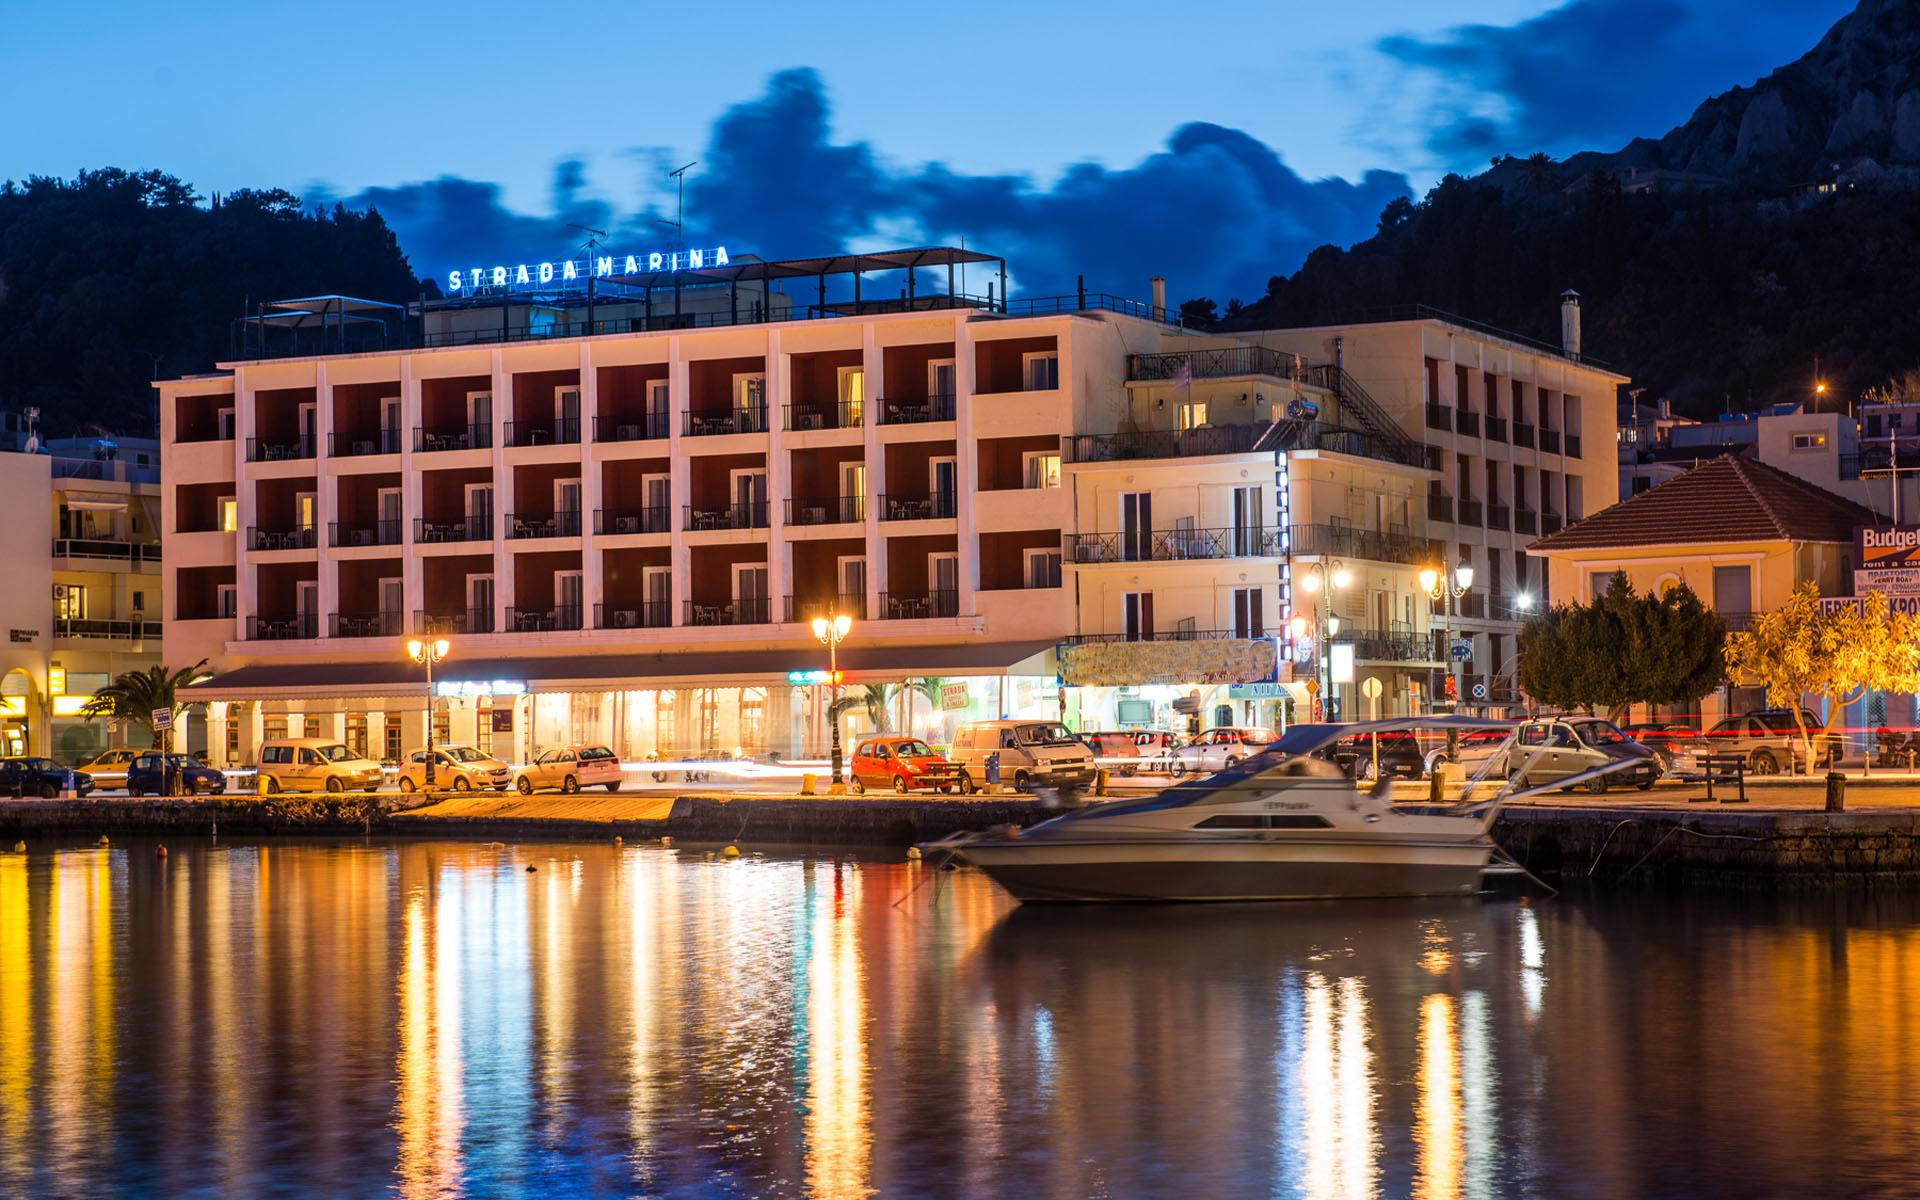 4* Strada Marina Hotel - Ζάκυνθος ✦ 4 Ημέρες (3 Διανυκτερεύσεις)